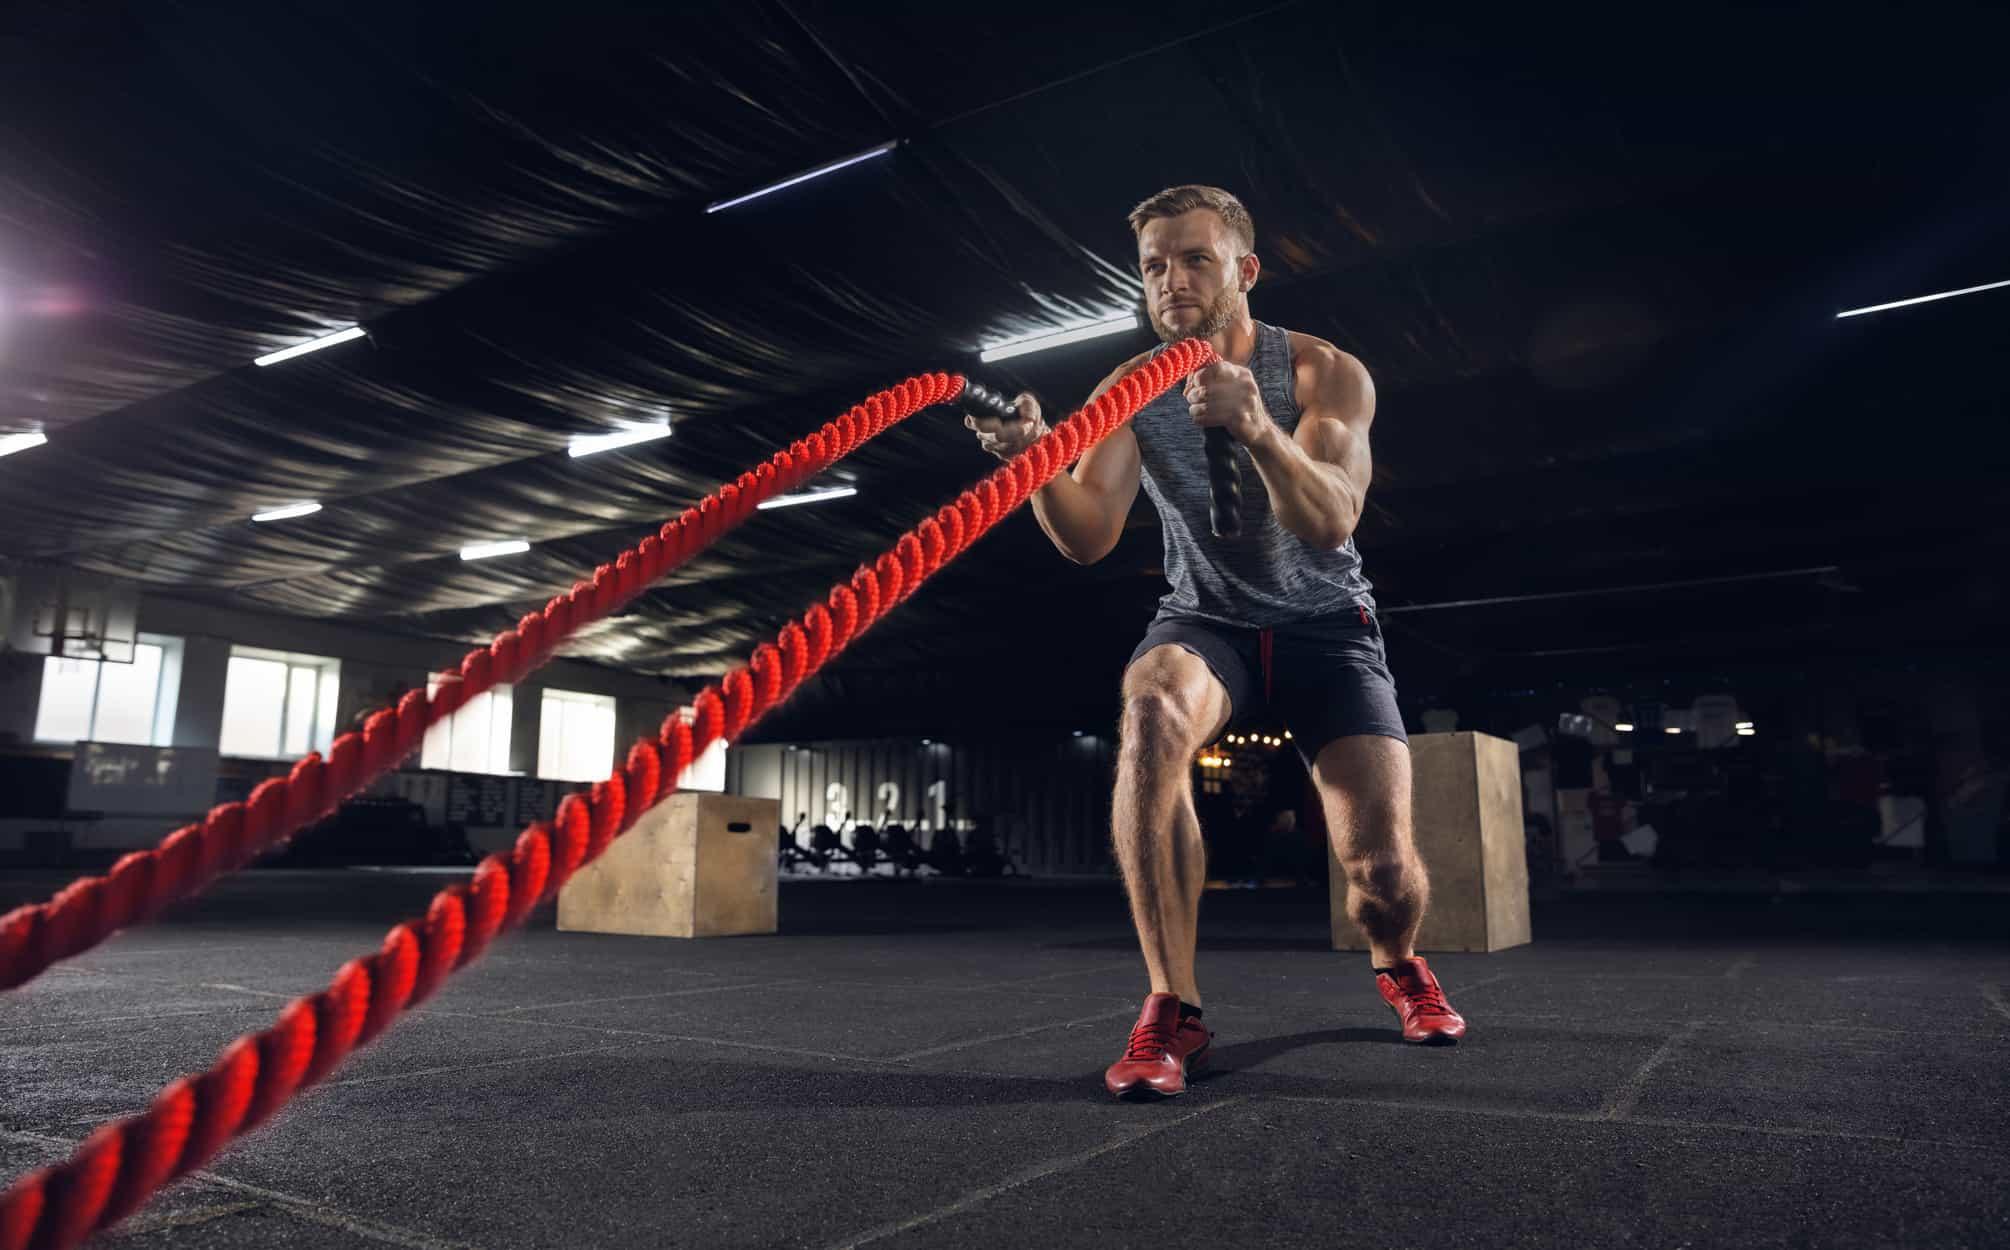 battle rope exercises for beginners